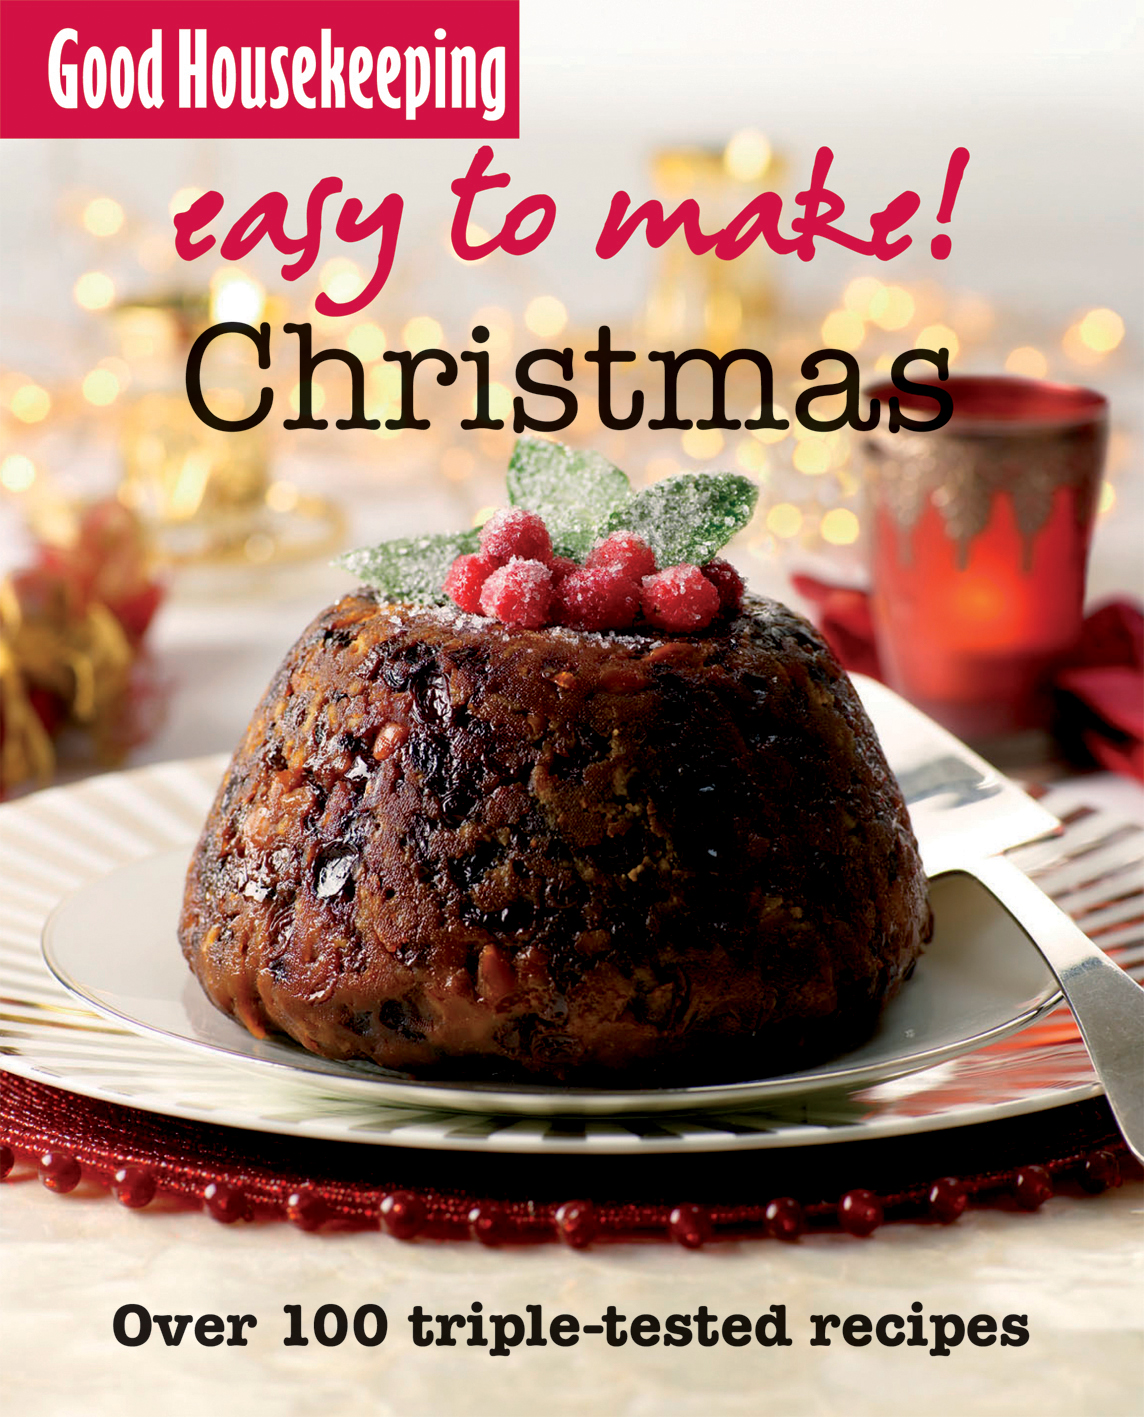 Good Housekeeping Easy to Make! Christmas